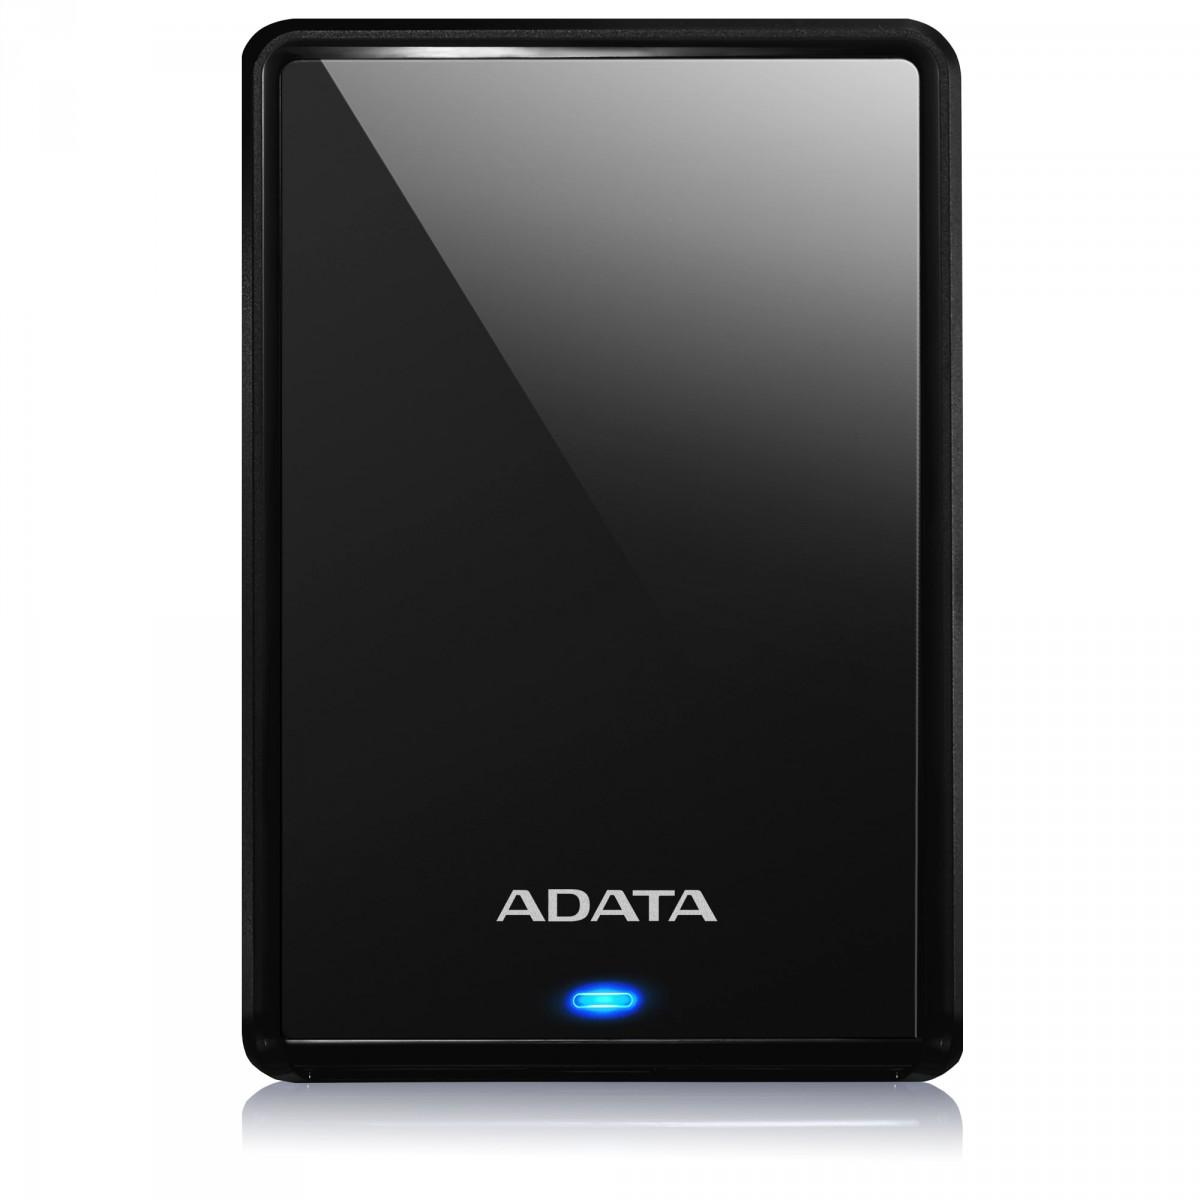 HD Externo Portátil Adata HV620S 2TB, USB 3.2, Black , AHV620S-2TU31-CBK